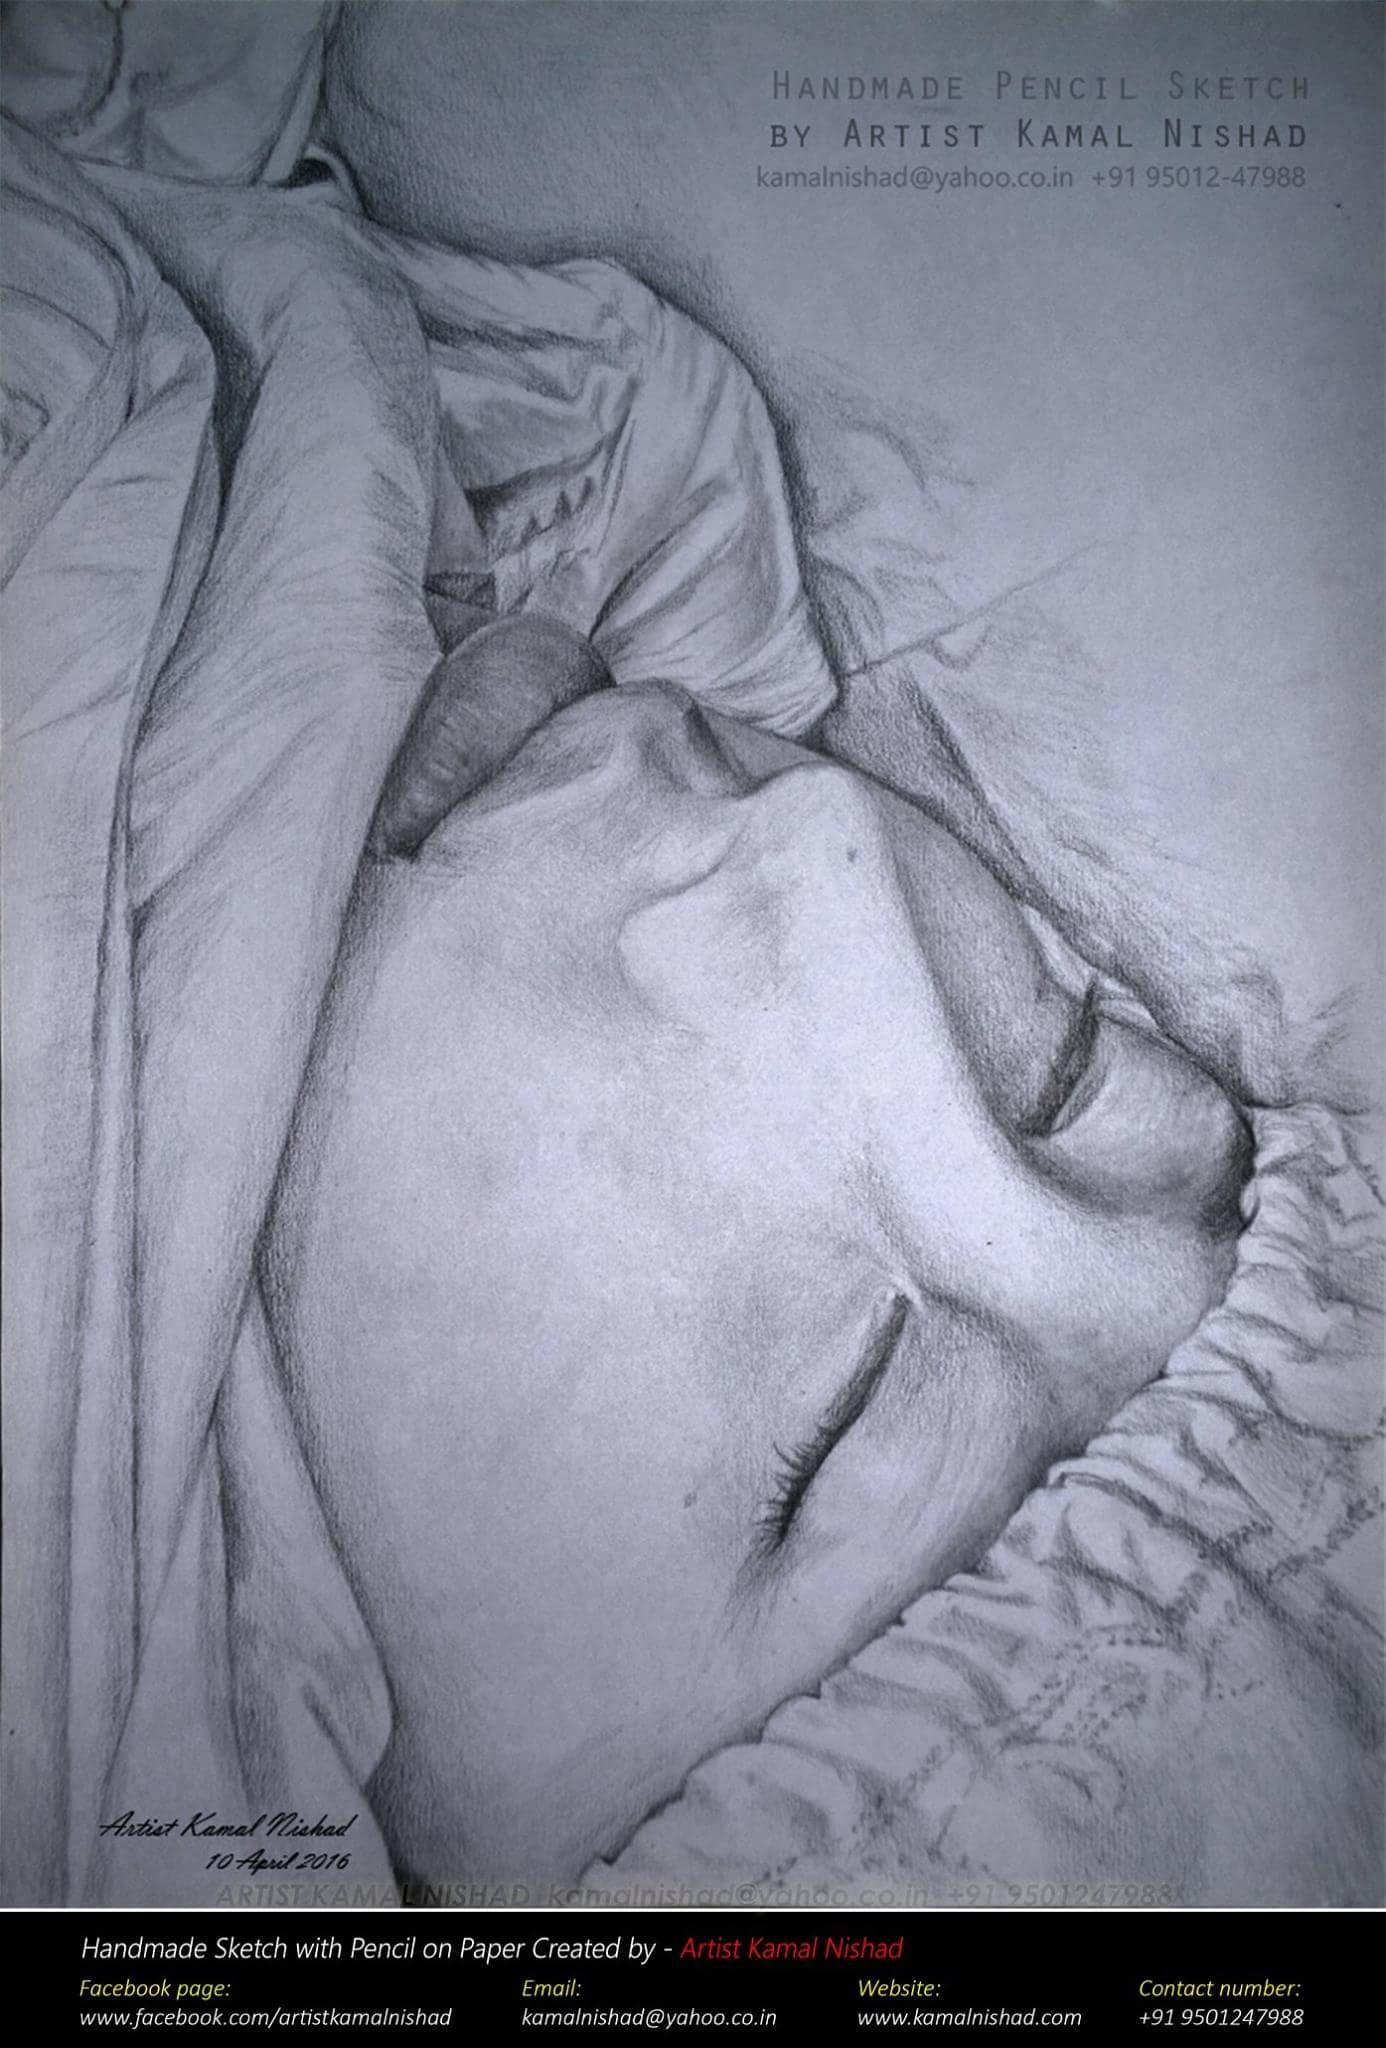 Chinese sleeping beauty pencil charcoal sketch by artist kamal nishad